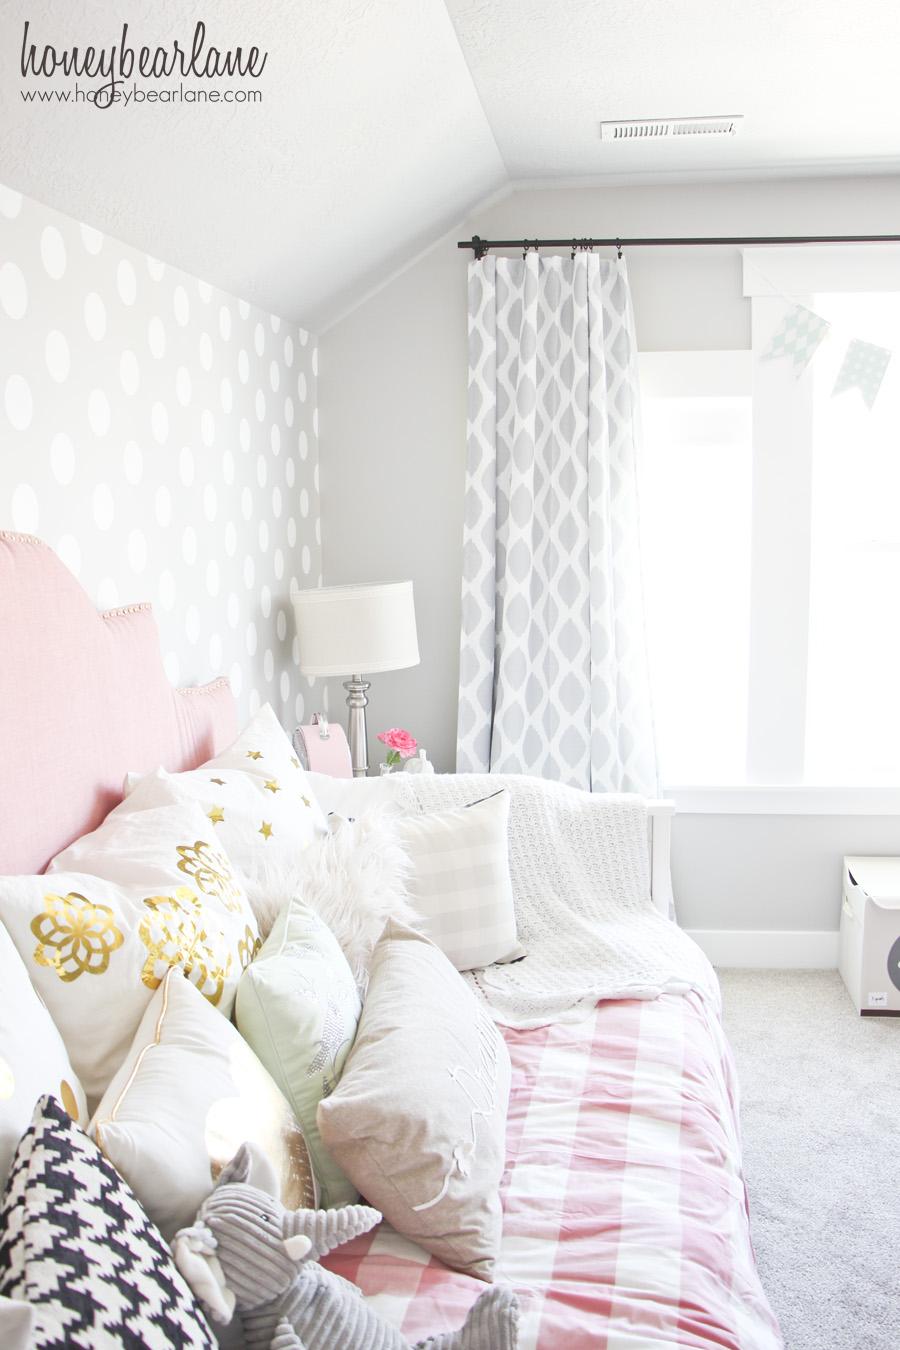 backsplash for white kitchen coffee signs decor best projects from 2015 - honeybear lane